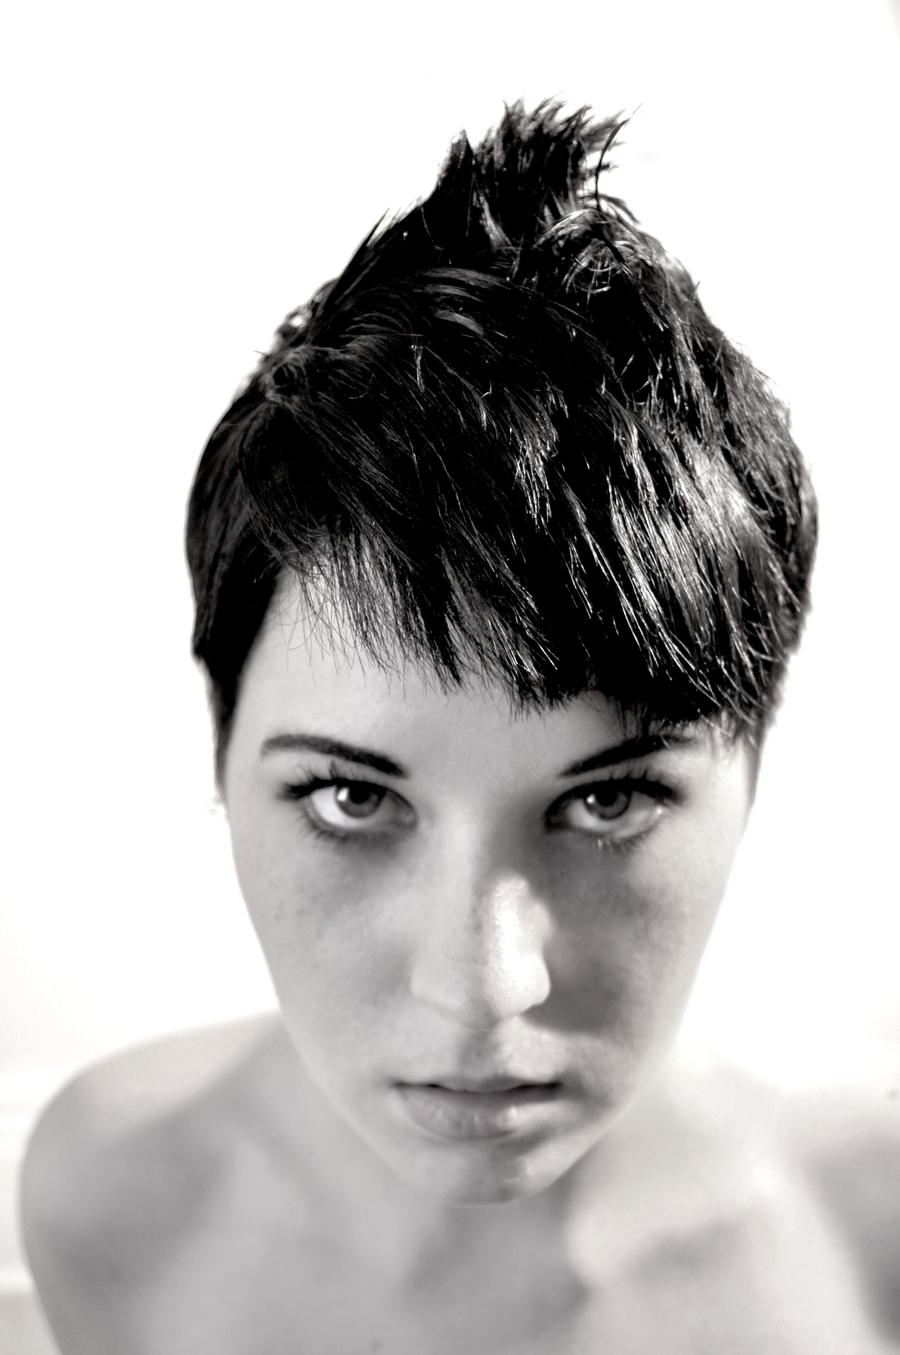 JaneyAvalon's Profile Picture